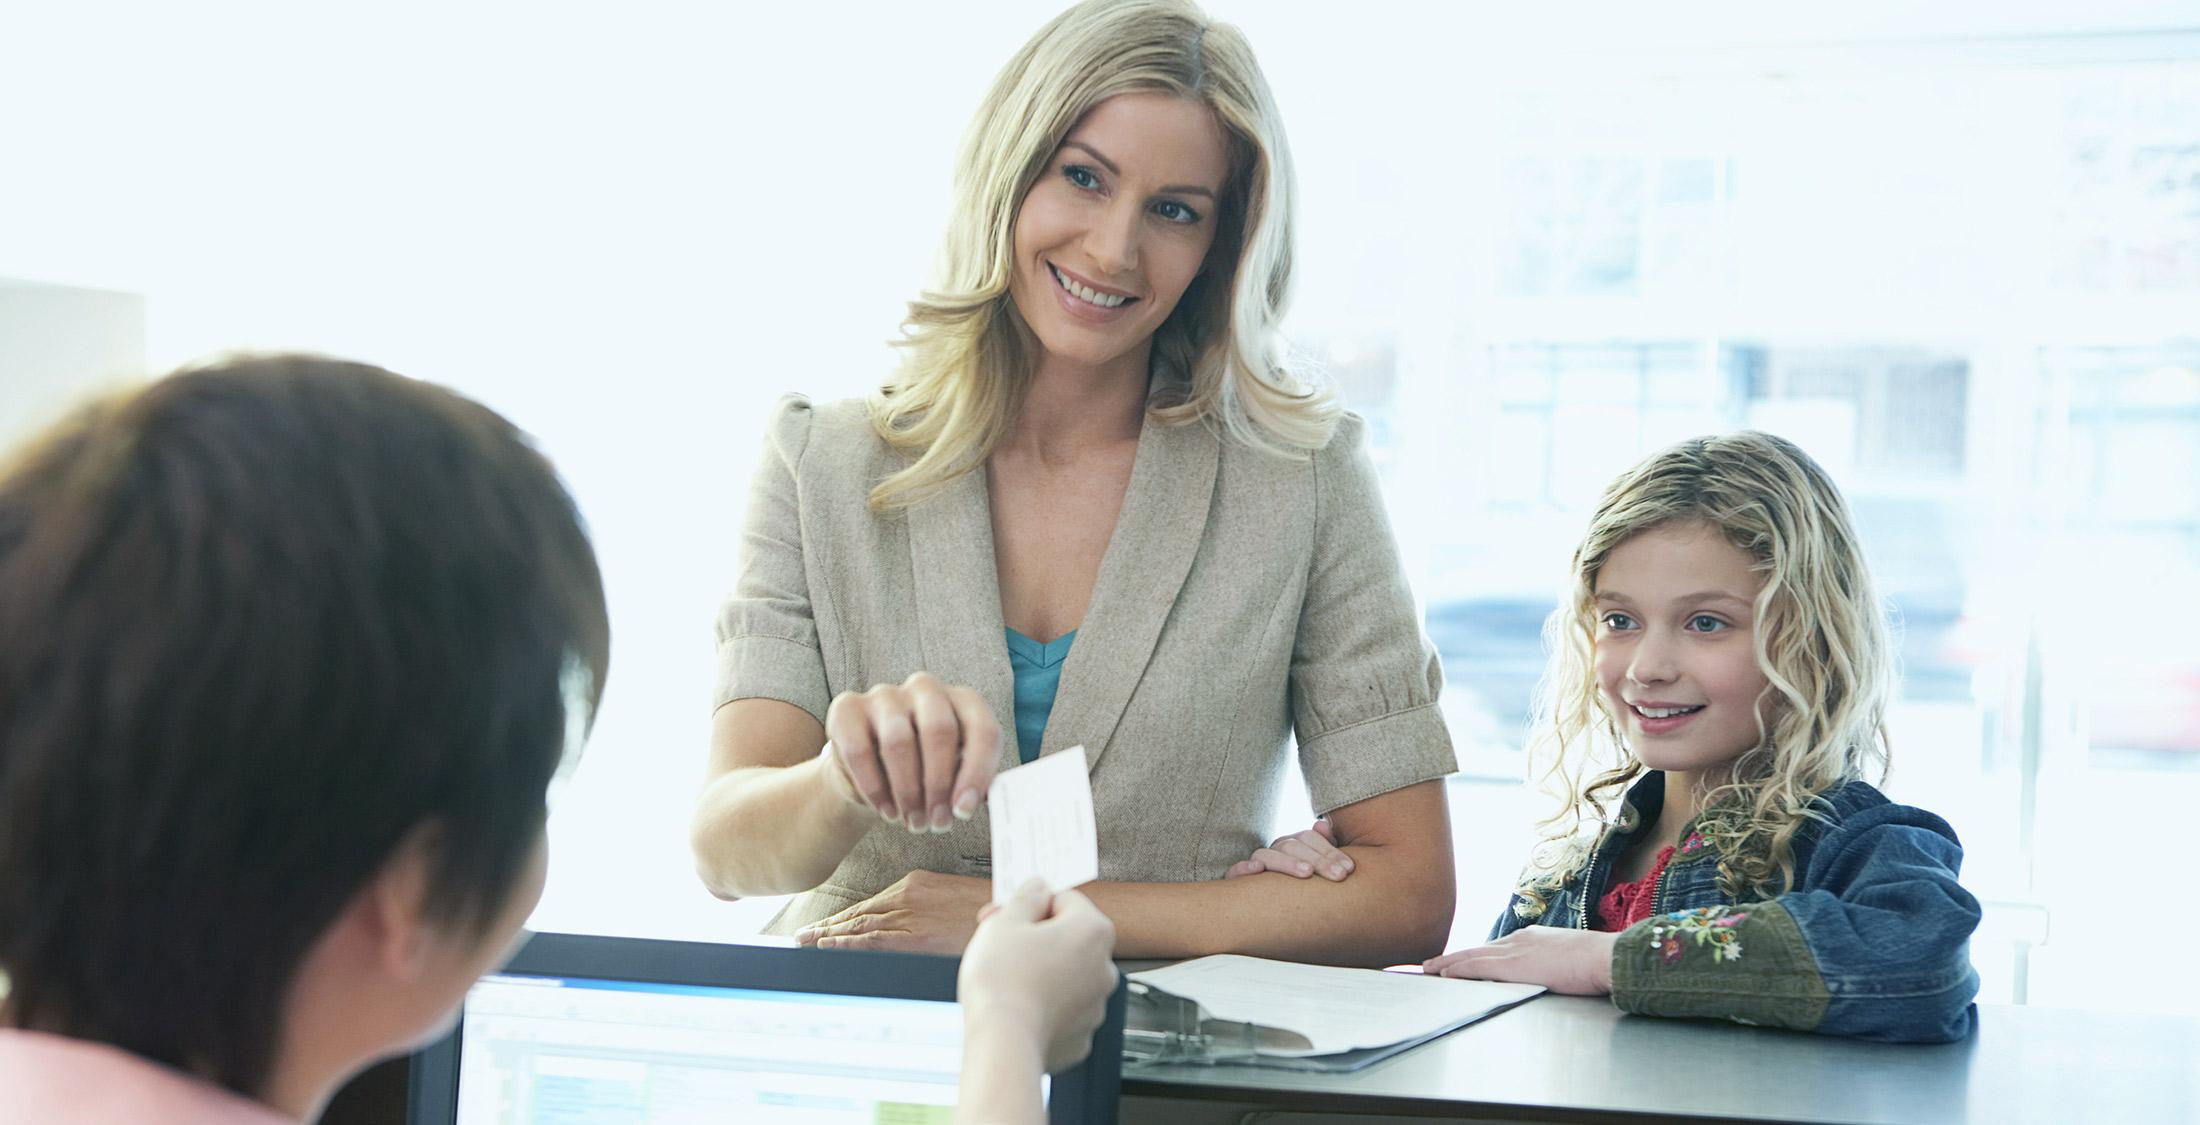 woman and girl checking account